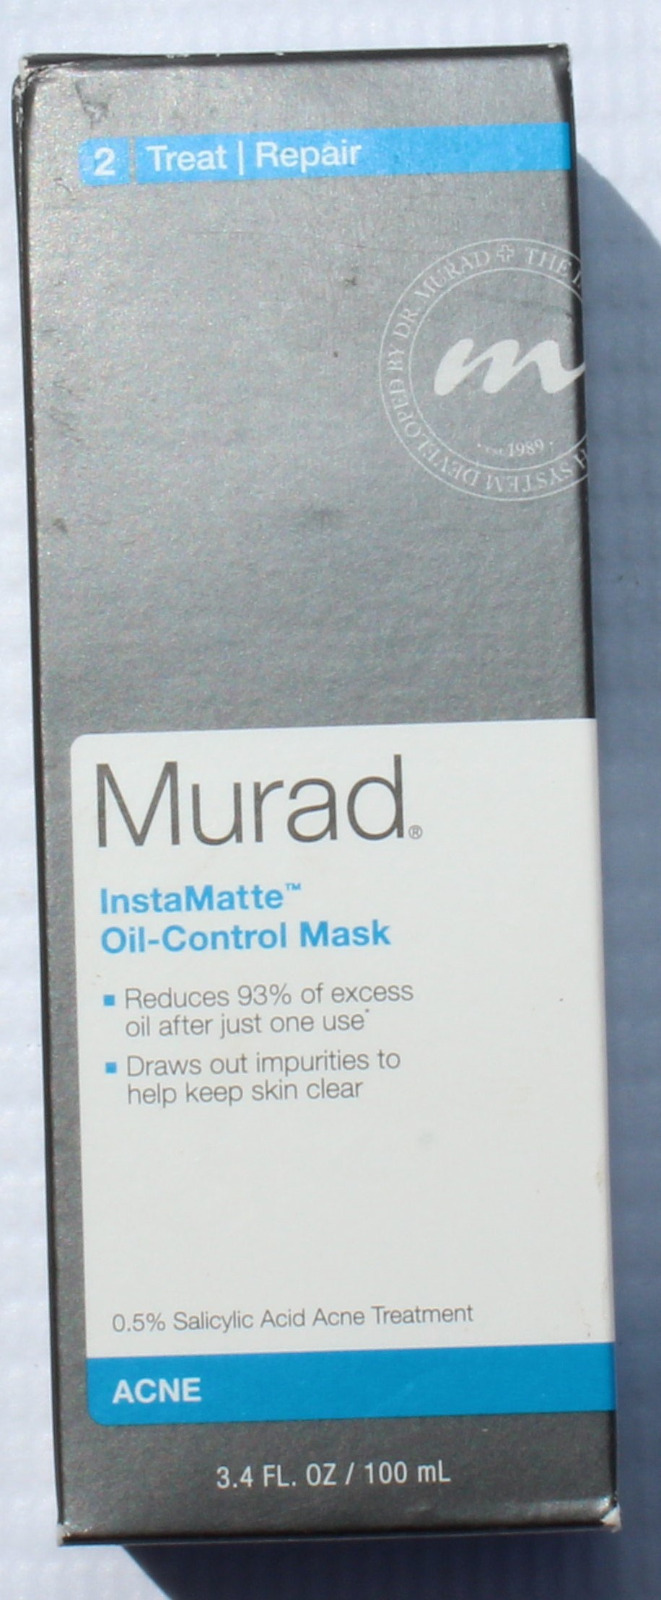 Instamatte Oil Control Mask